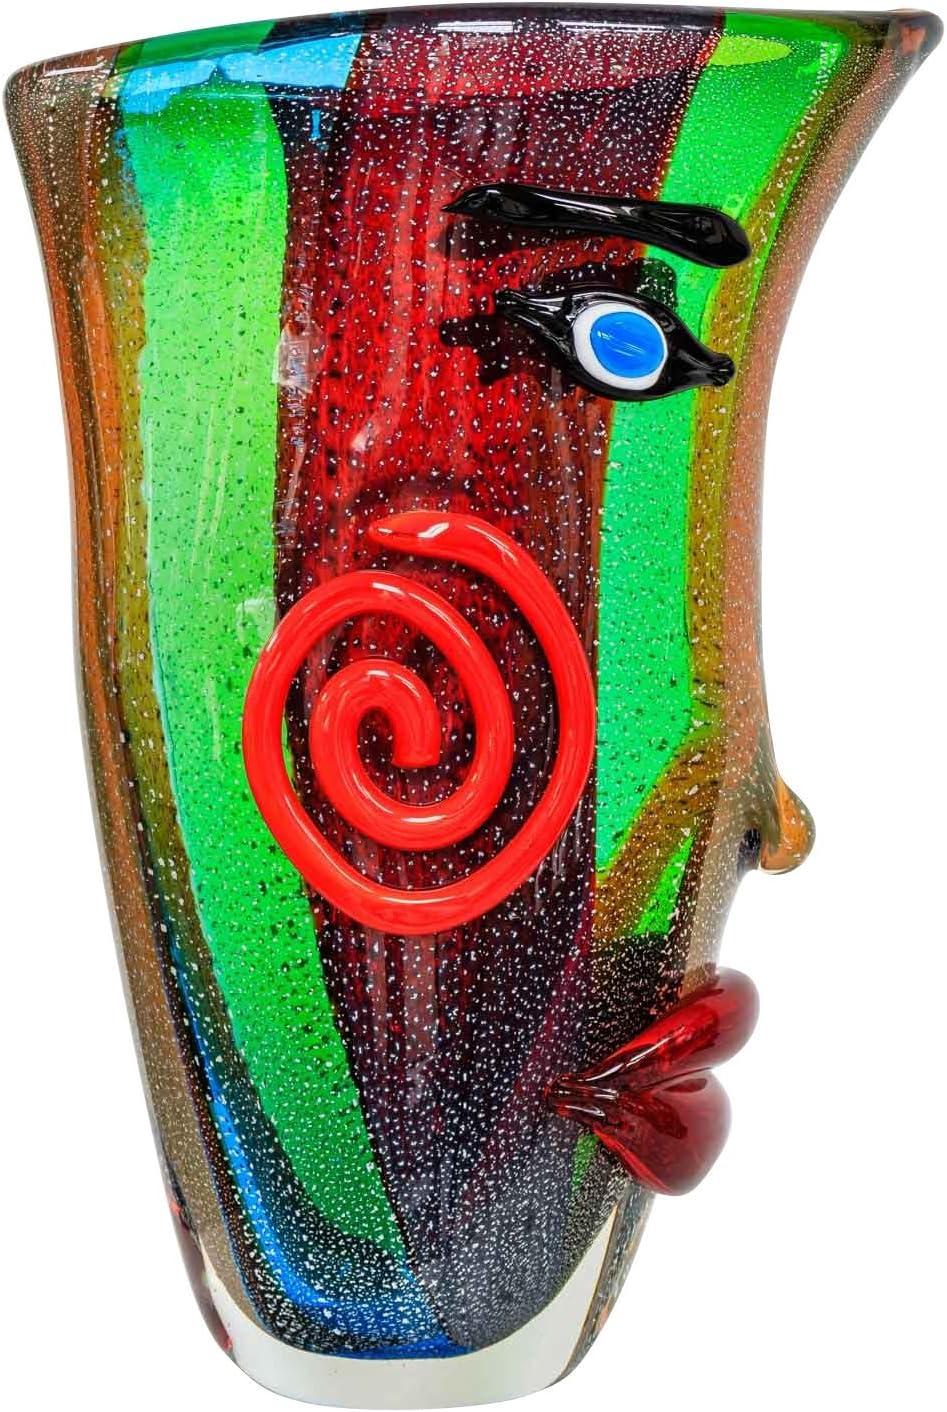 Florero de Cristal Rostro Vidrio Estilo Antiguo Murano 35cm jarr/ón